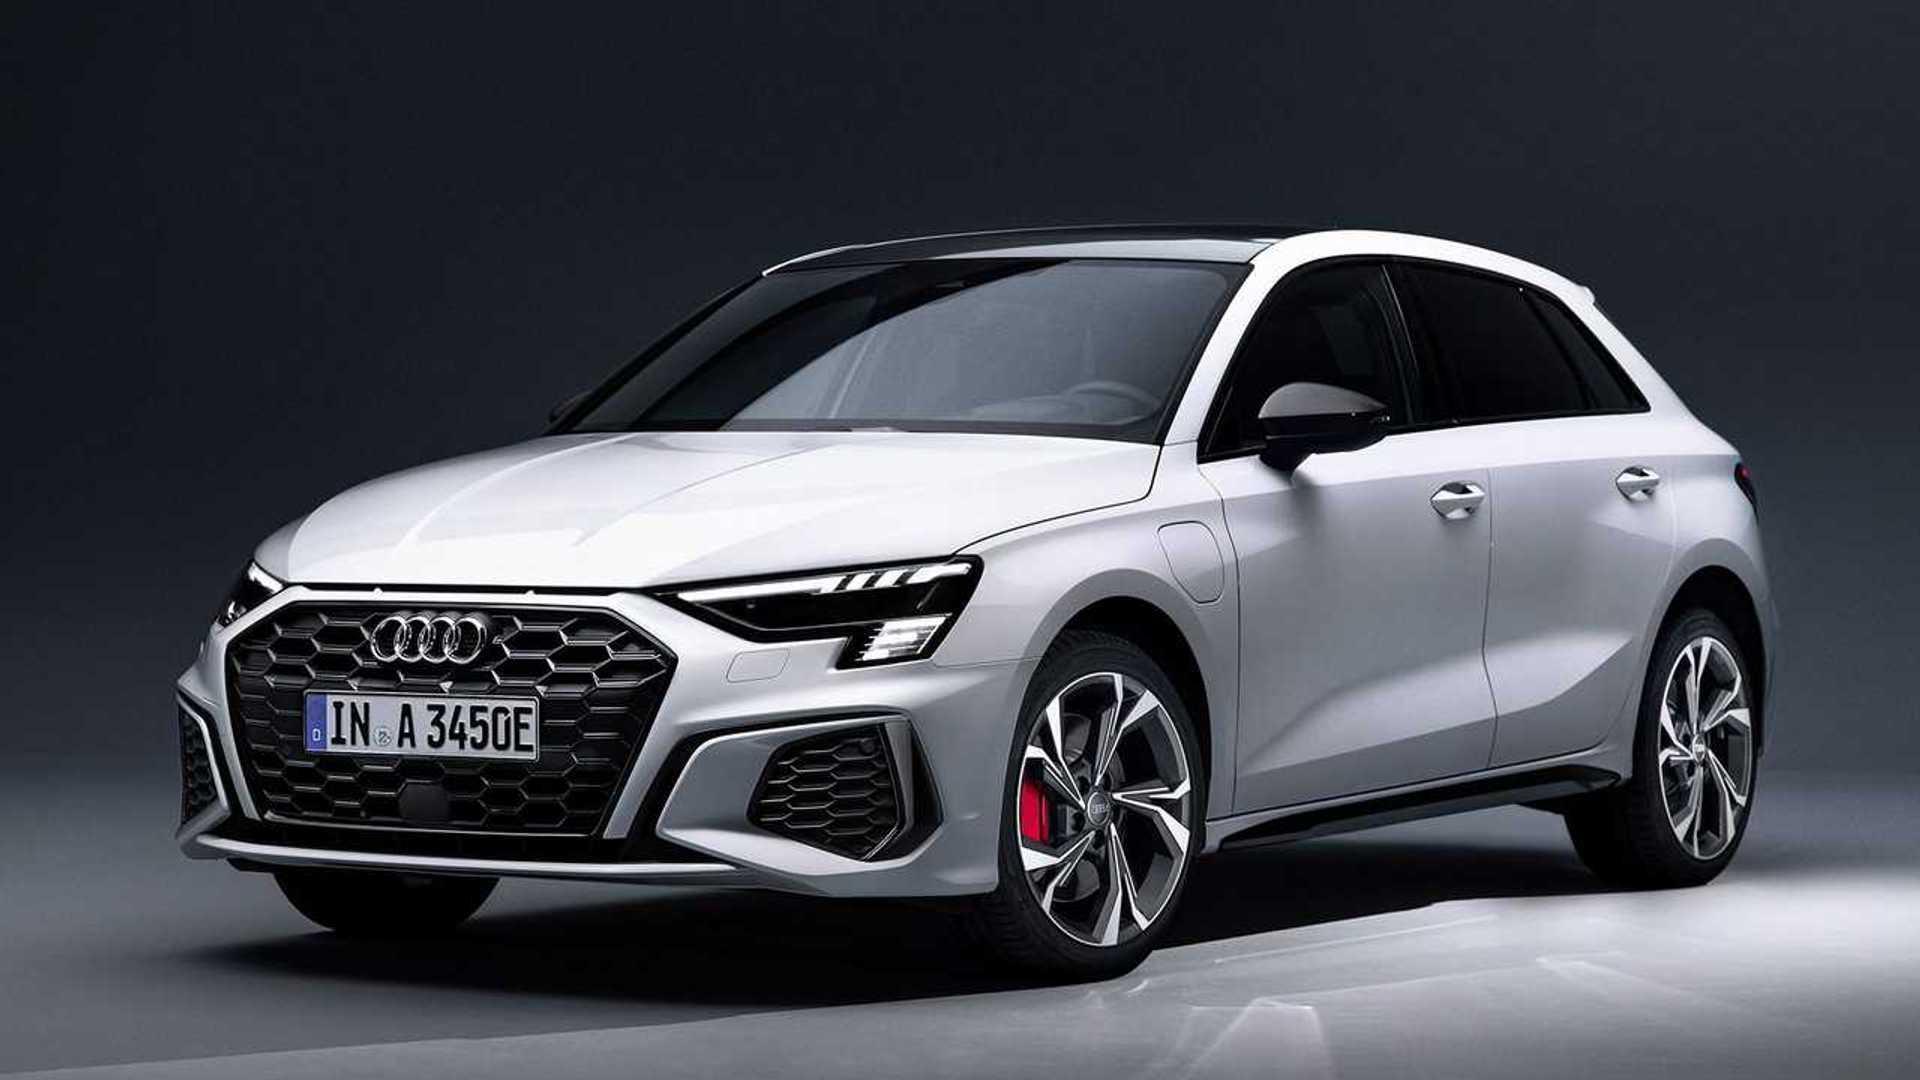 2021 Audi A3 Sportback 45 Tfsi E Has 242 Hp 39 Mile Electric Range Automotobuzz Com